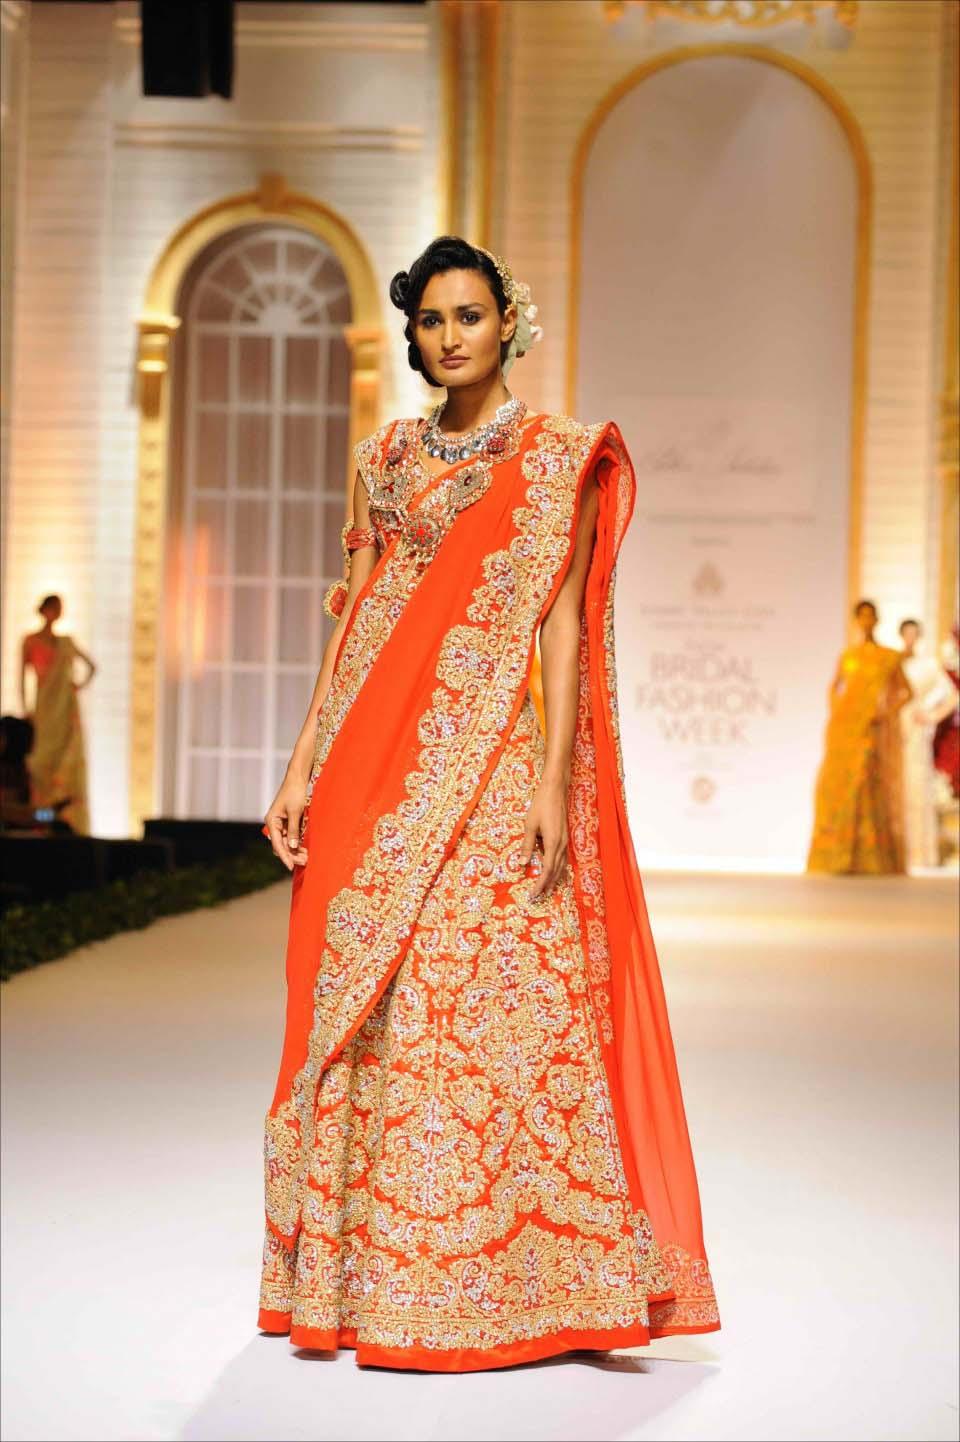 Latest Indian Designers Barat Dresses for Wedding Brides 2016-2017 (23)